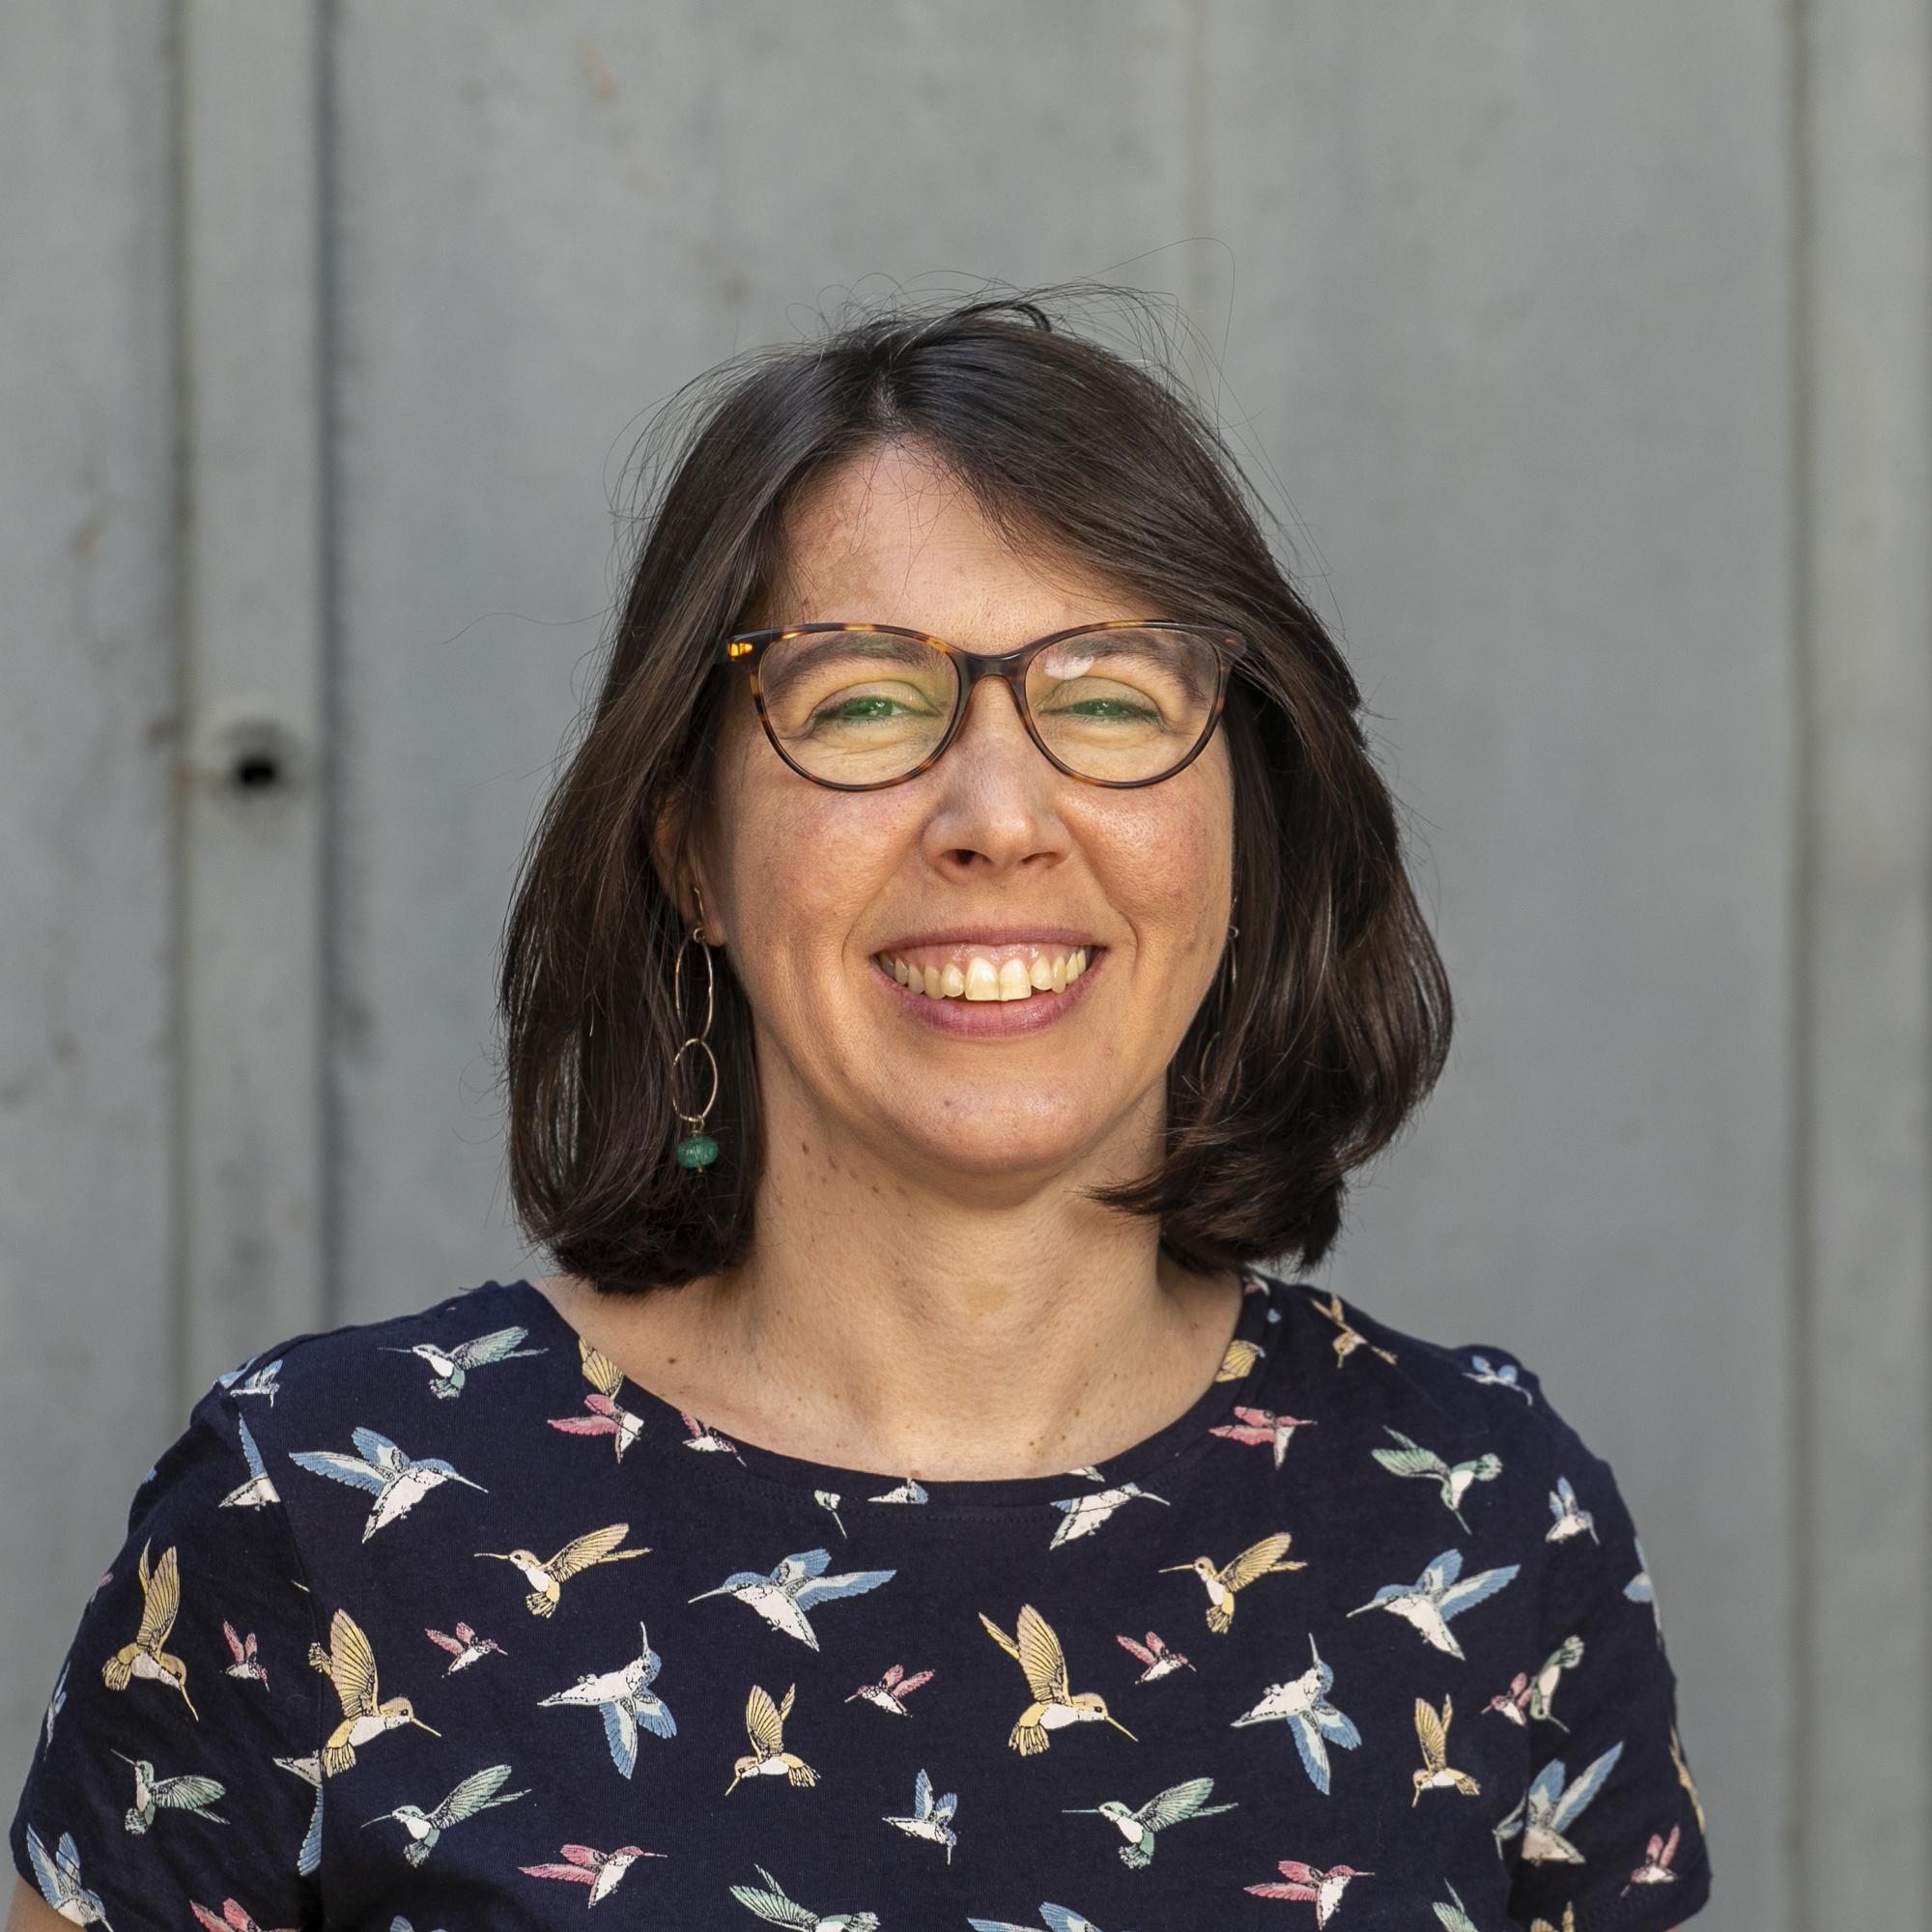 Elisenda Rentería Pérez